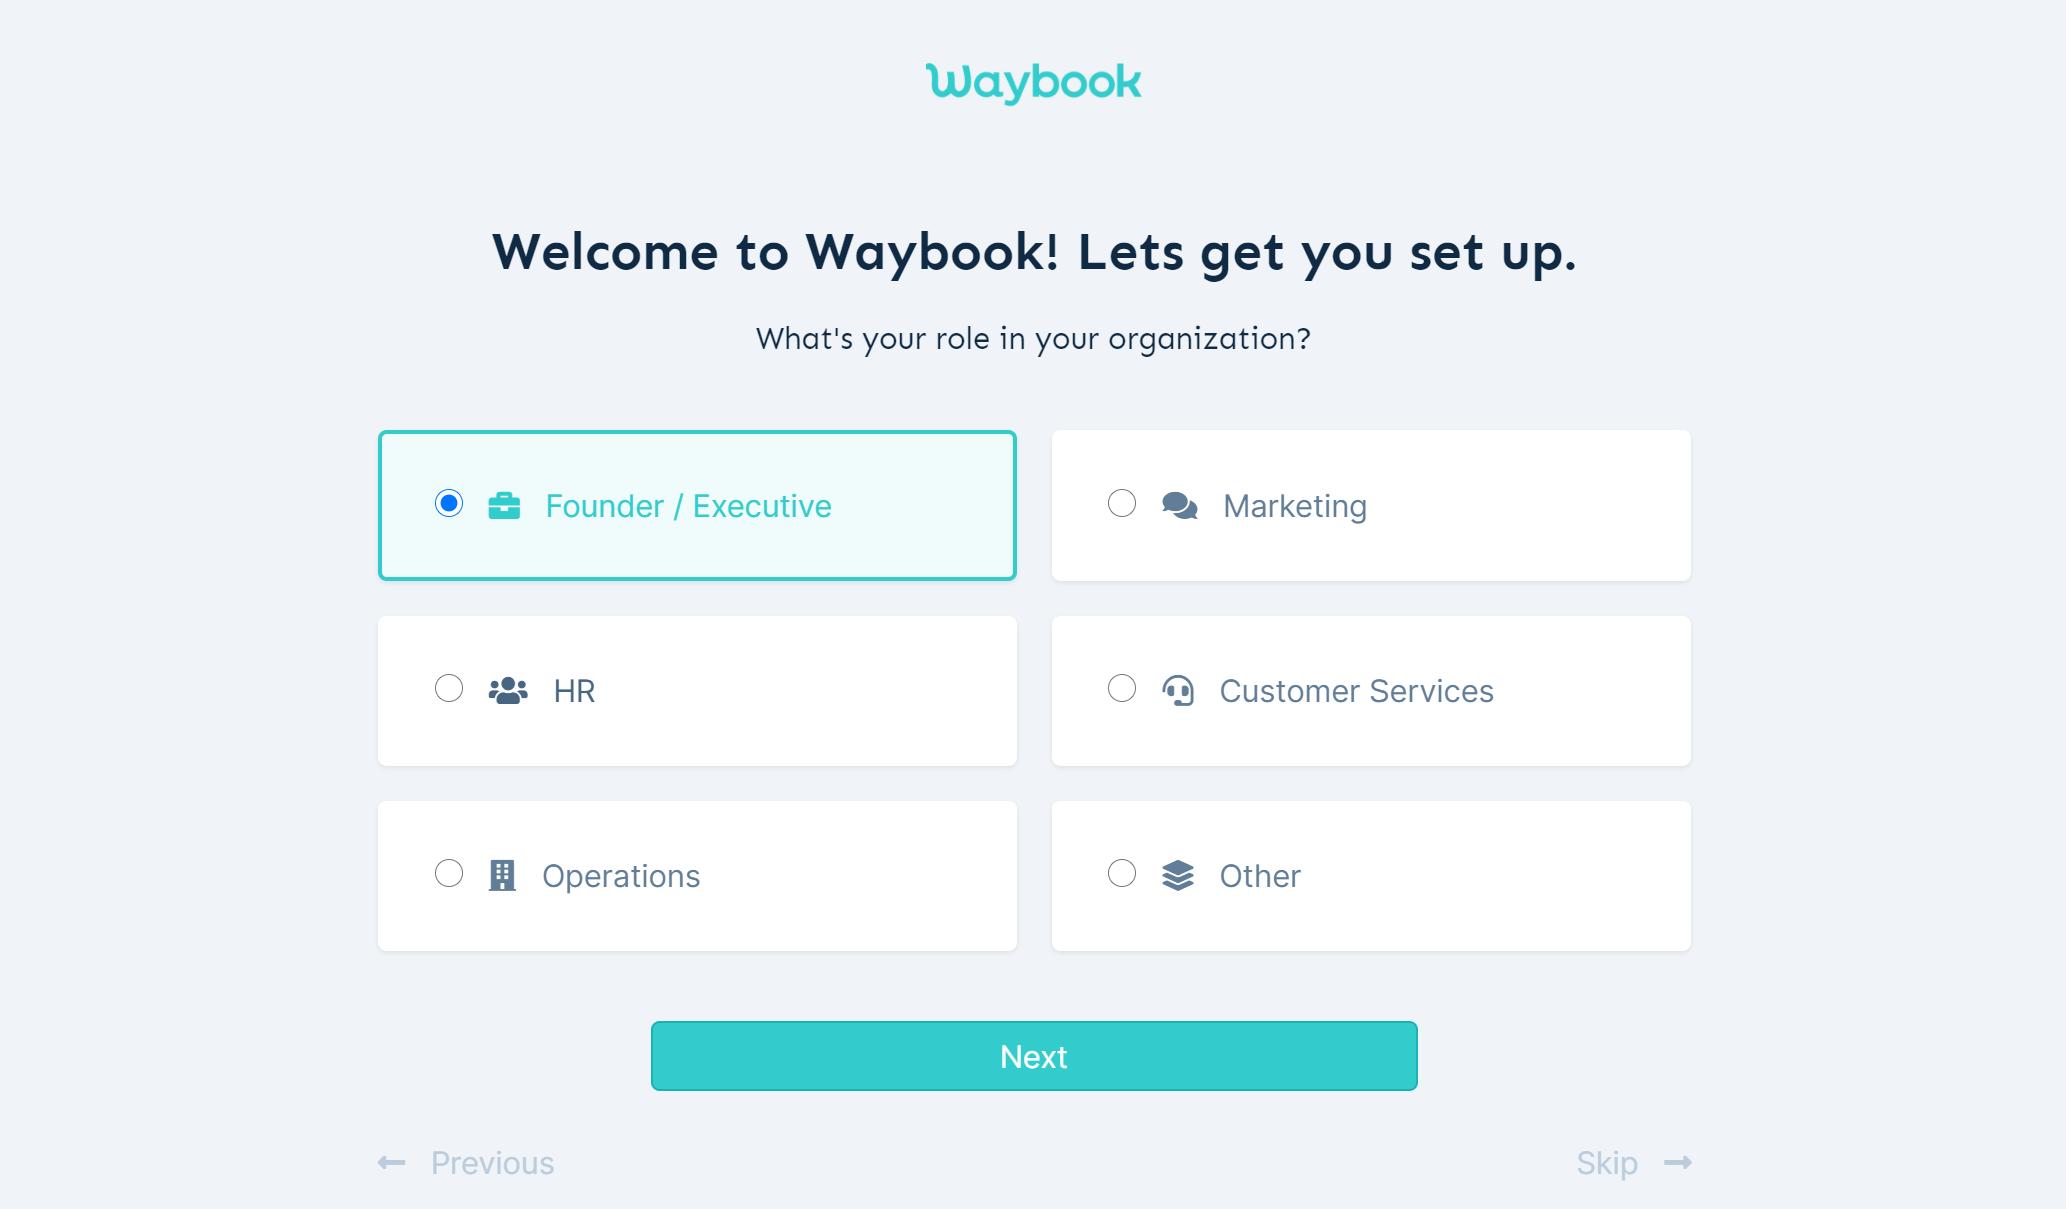 Waybook - Onboarding process